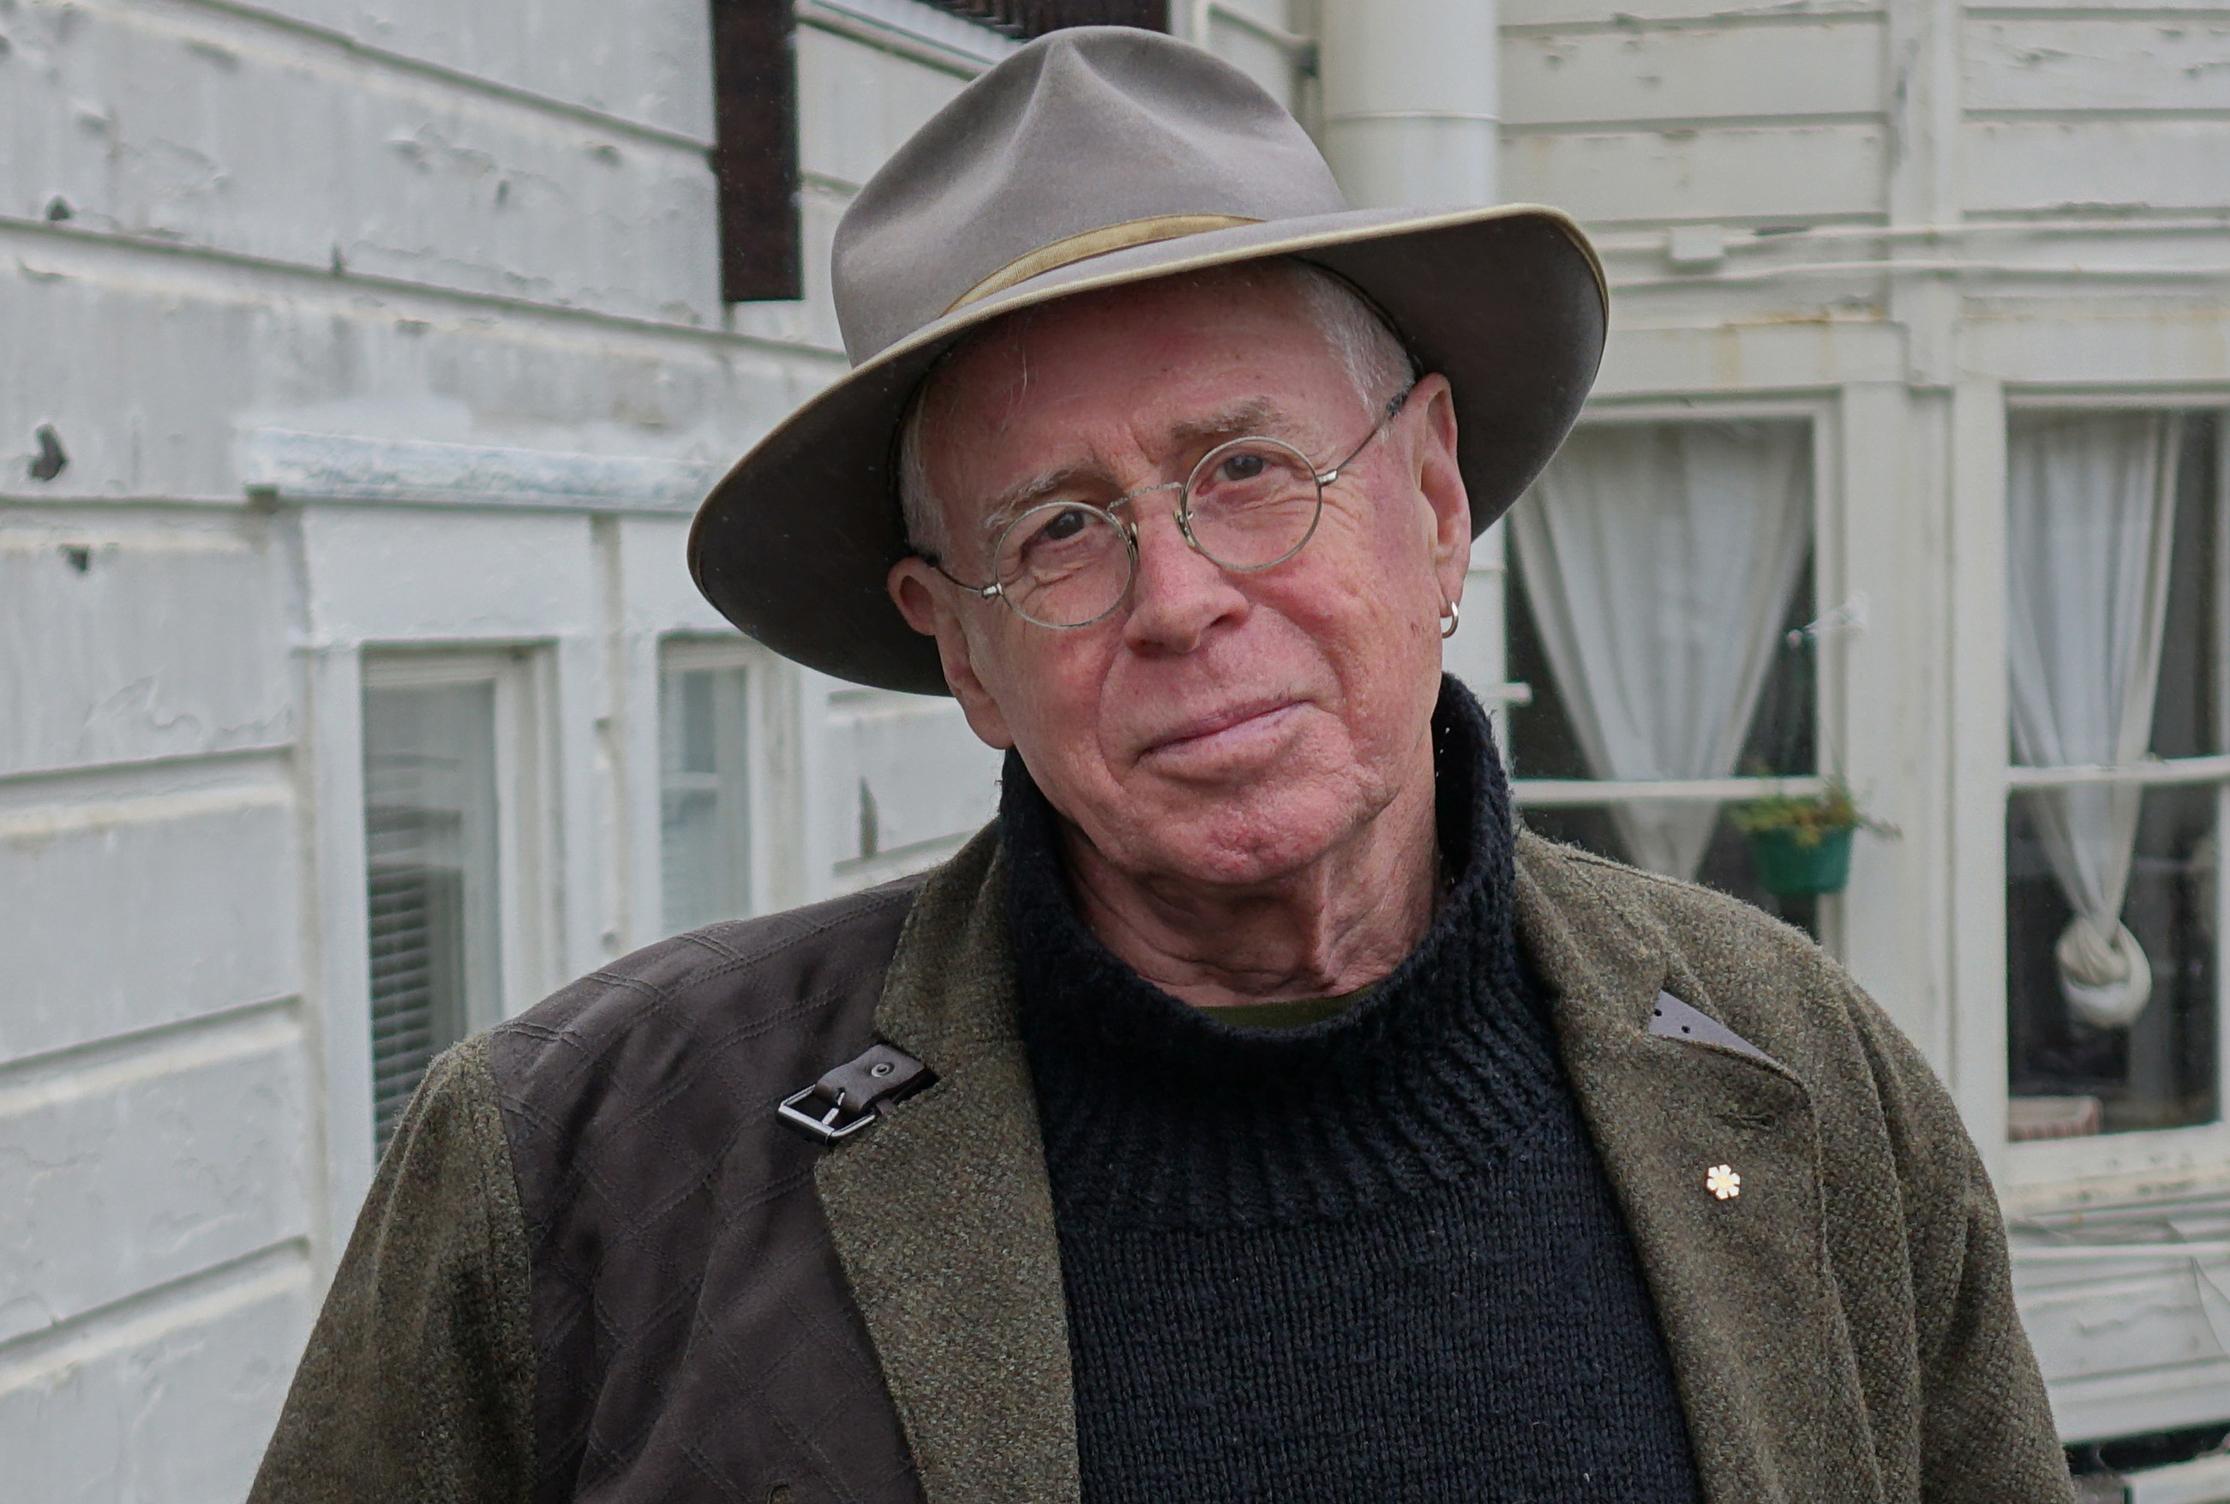 Counsel of Elders: Bruce Cockburn on Serving as Messenger